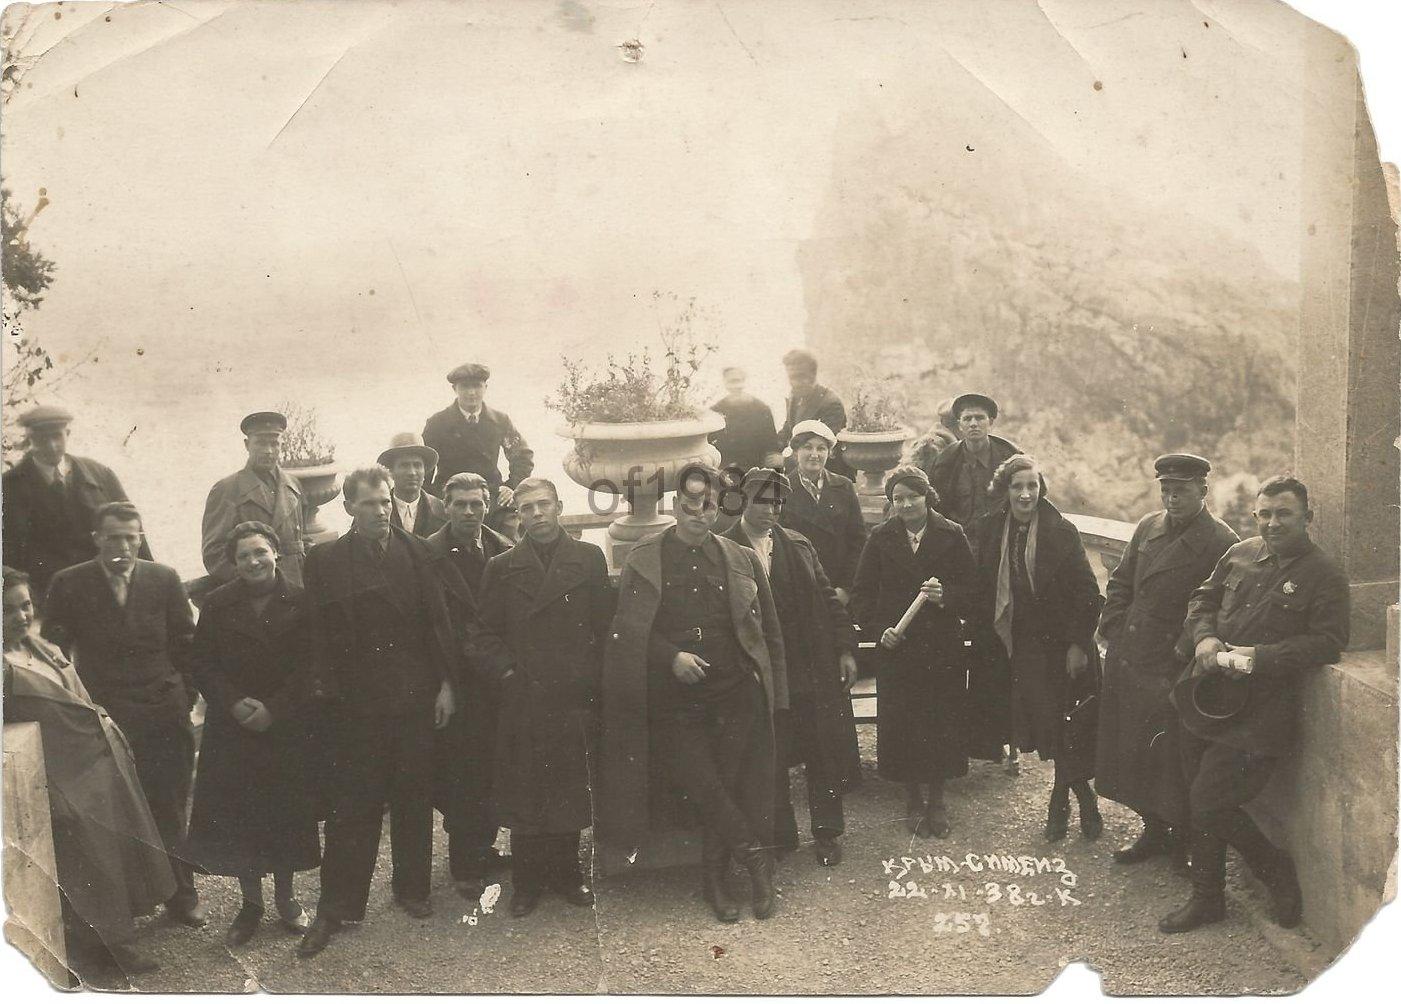 1938. Сотрудники НКВД на отдыхе в Крыму. Симеиз